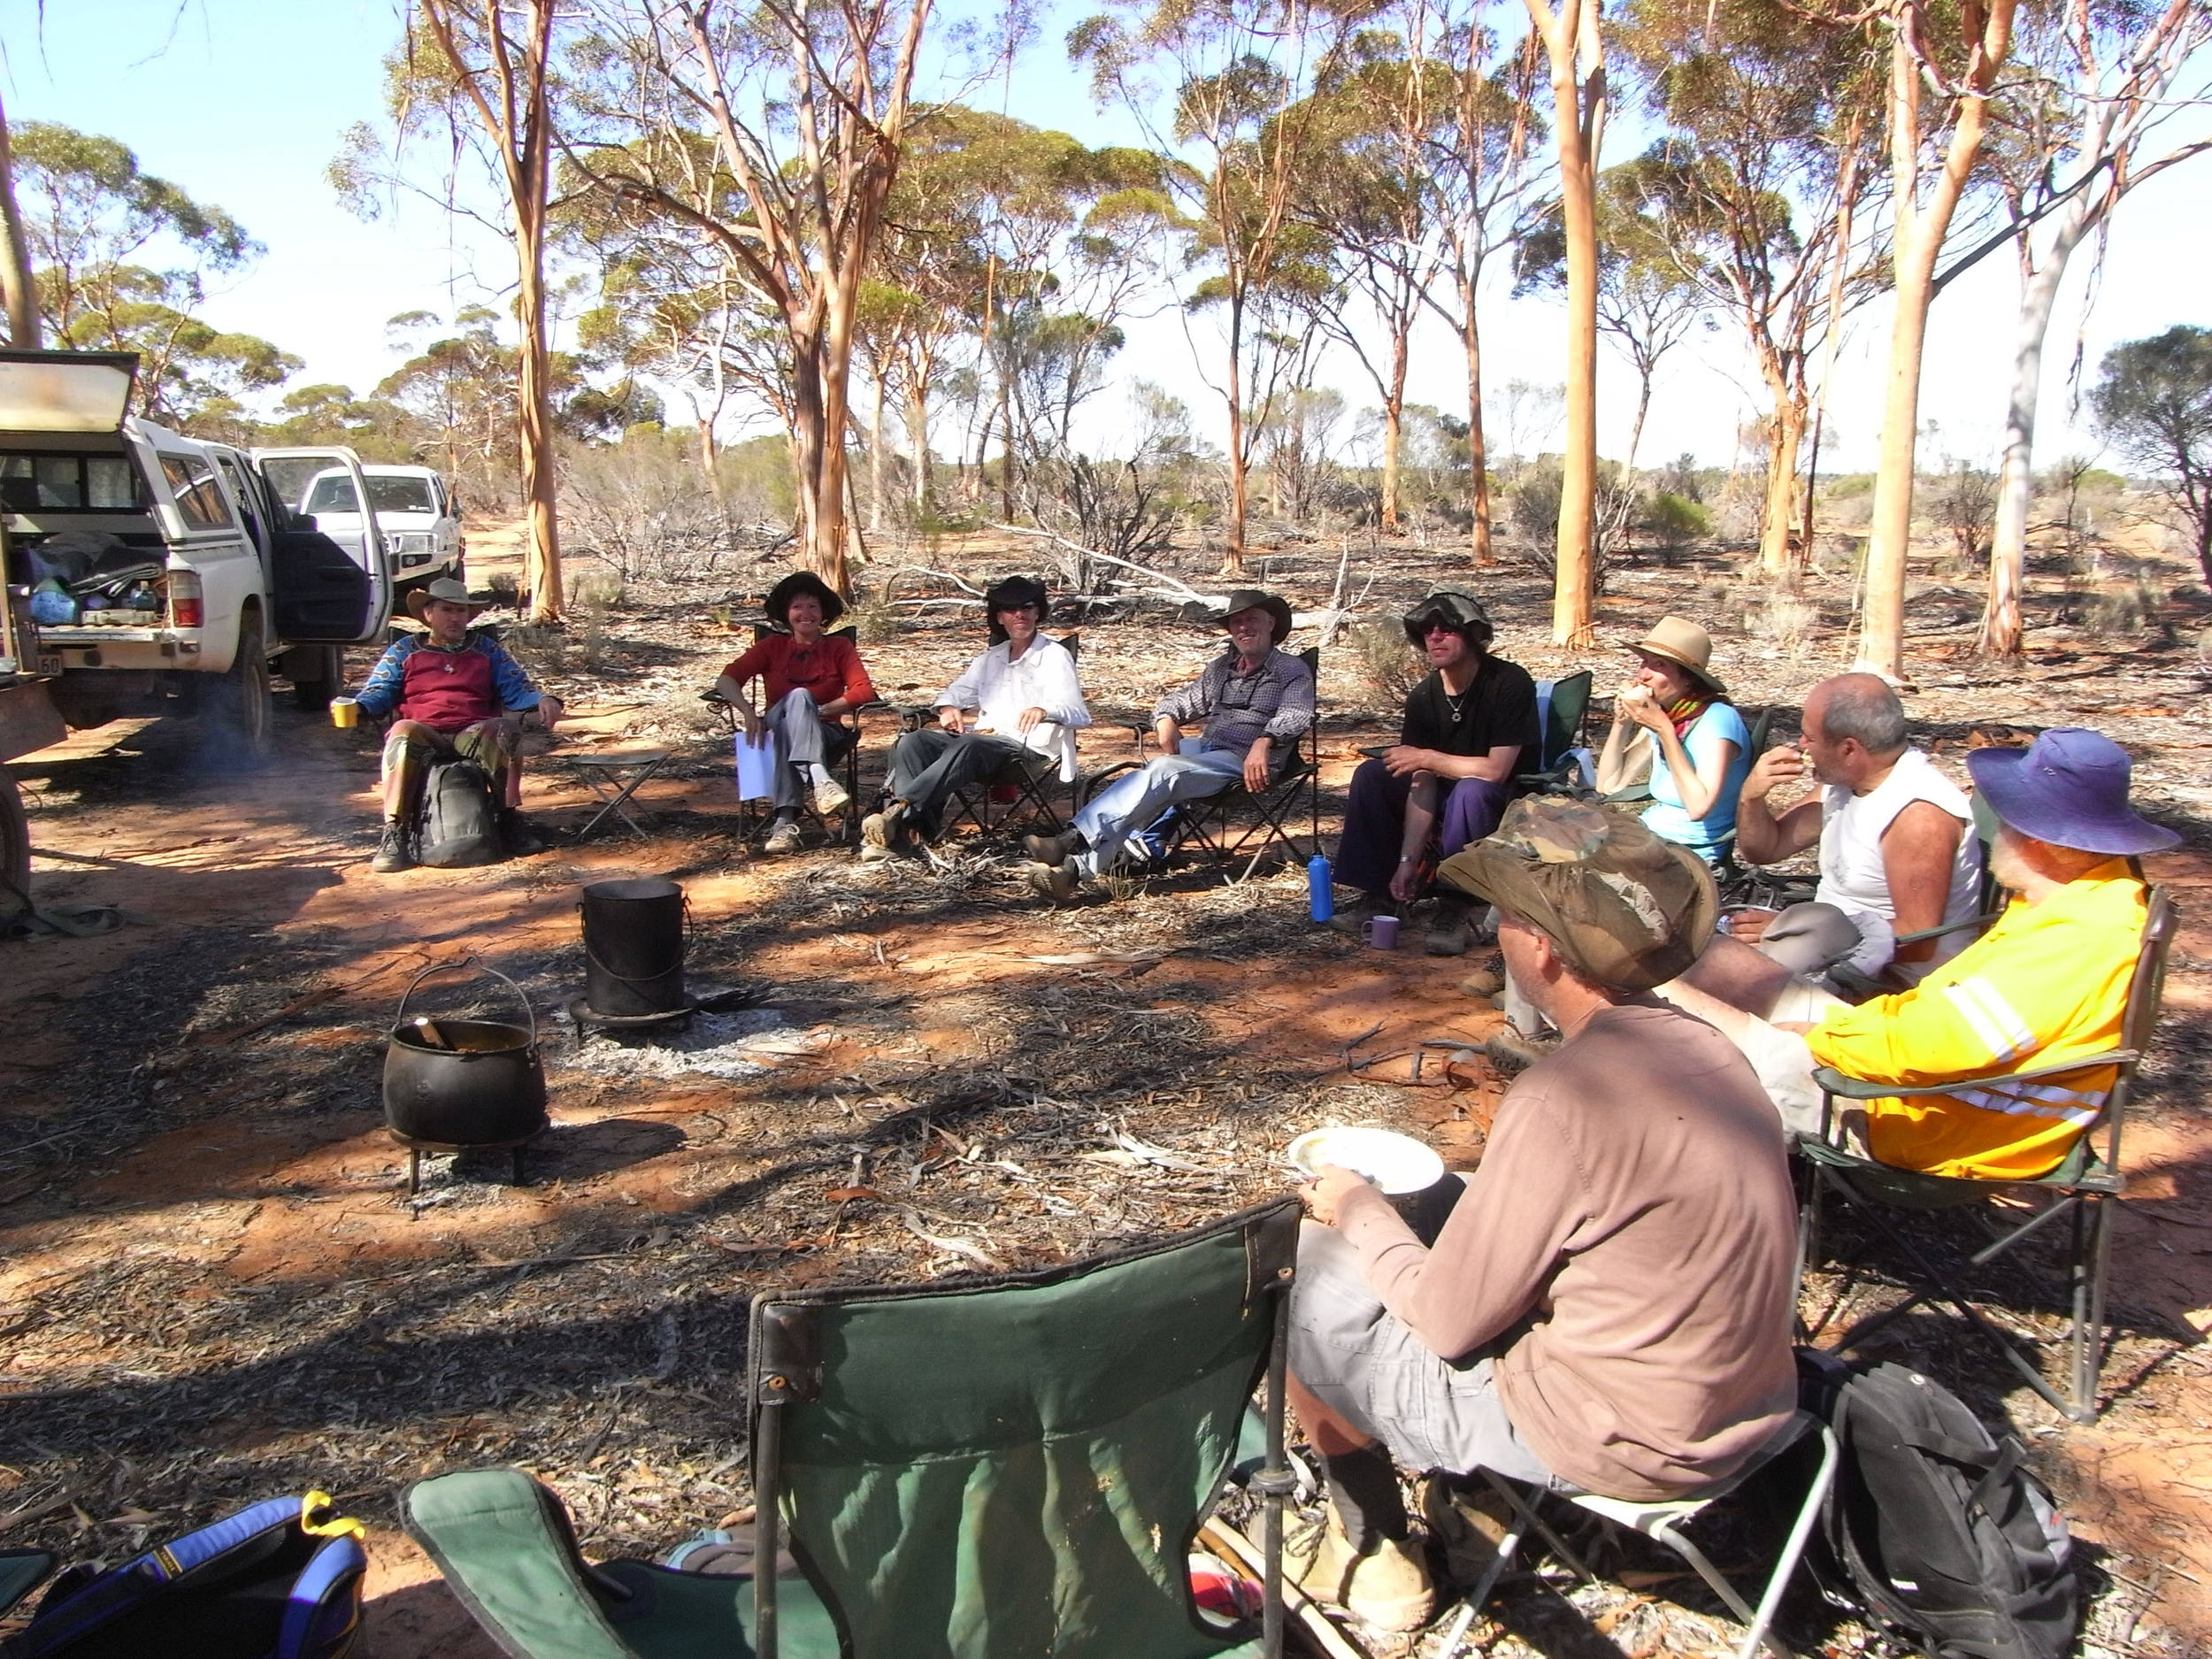 group round camppot.jpg